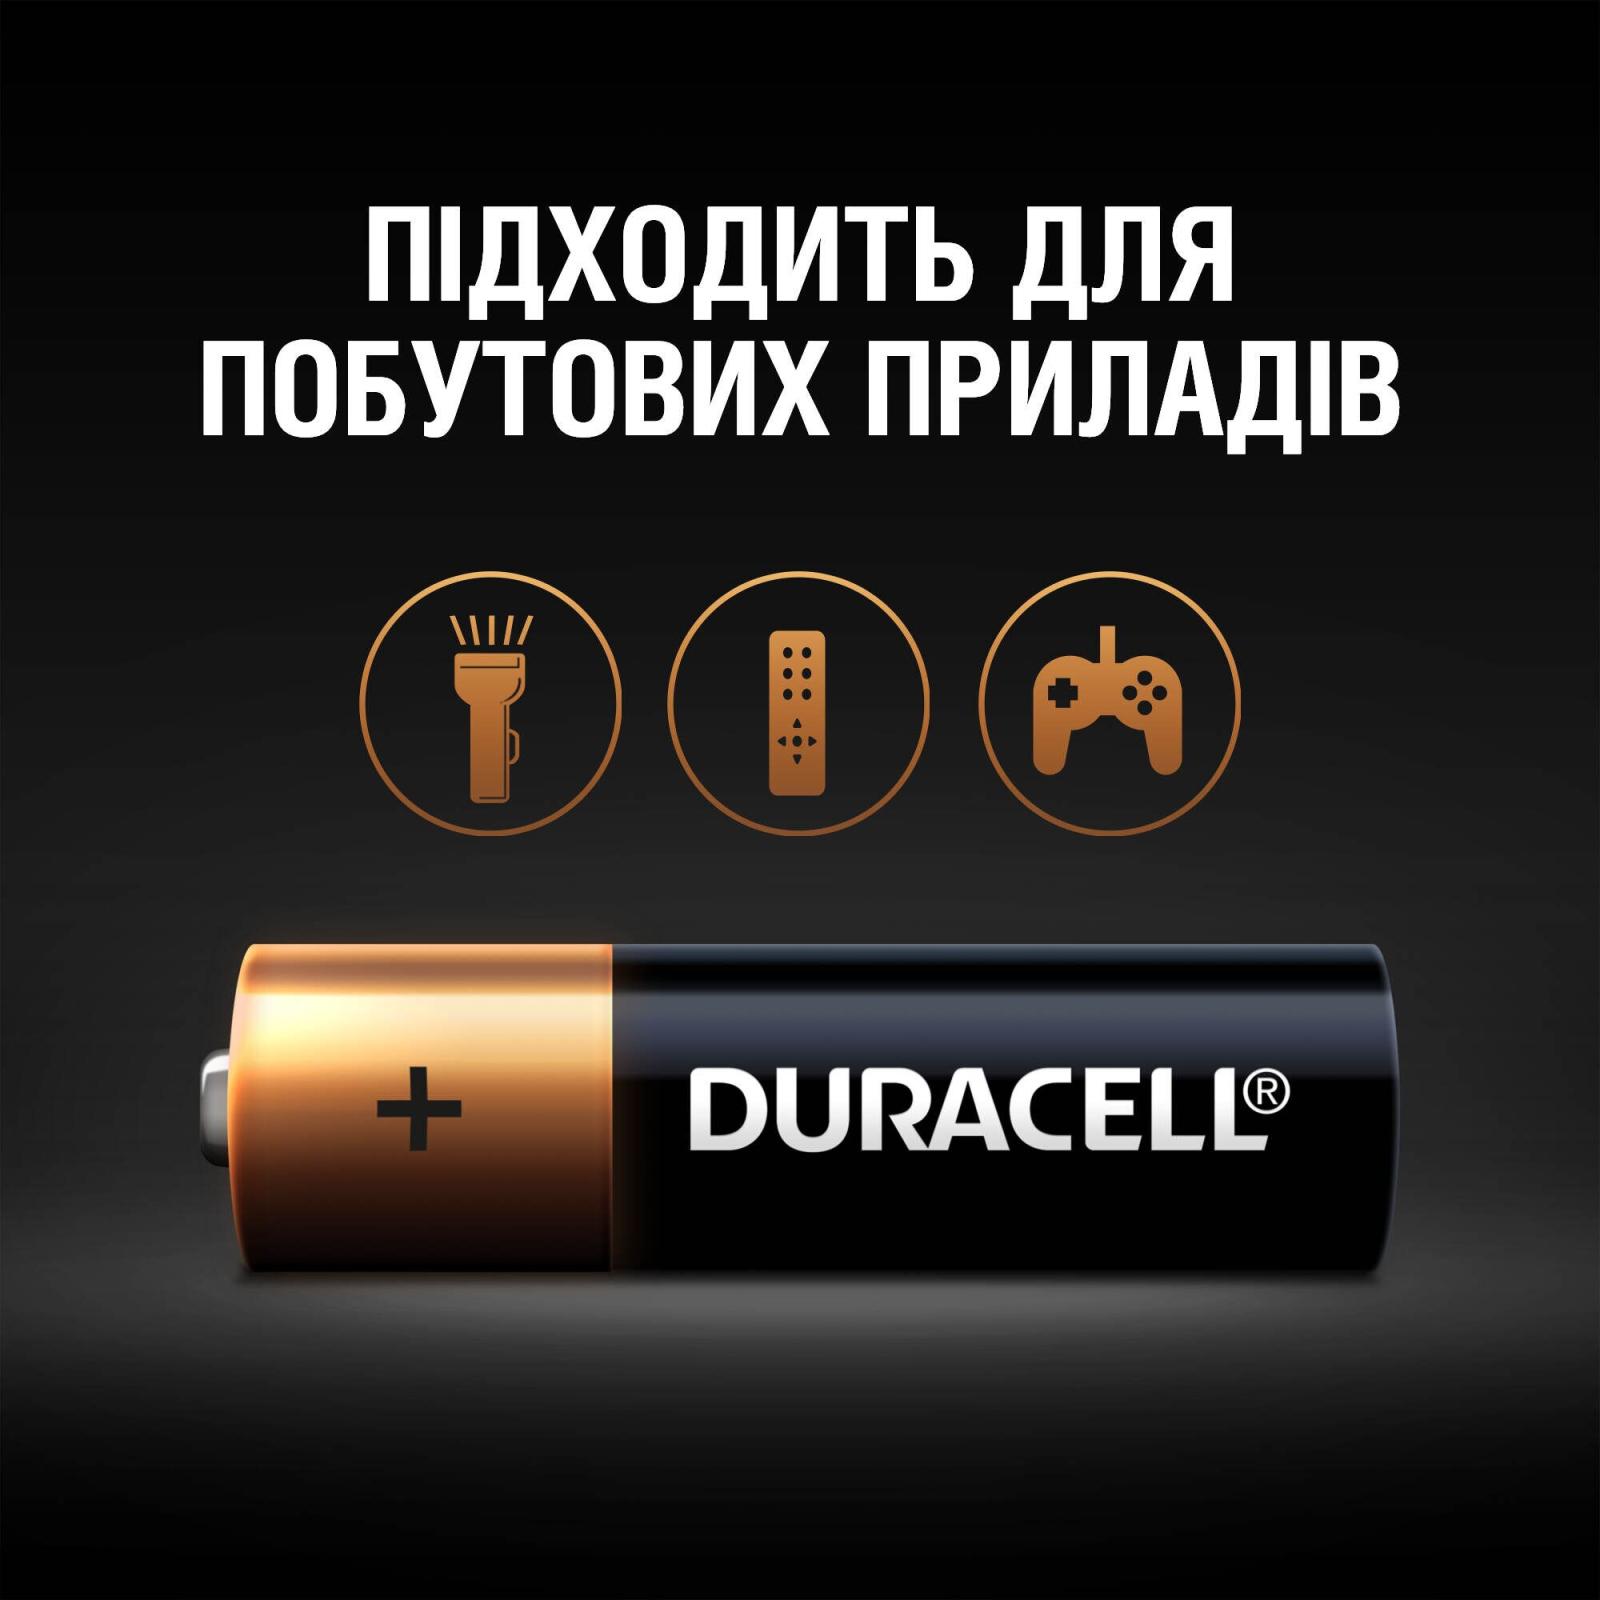 Батарейка Duracell AA MN1500 LR06 * 2 (5000394058163 / 81551267) изображение 5